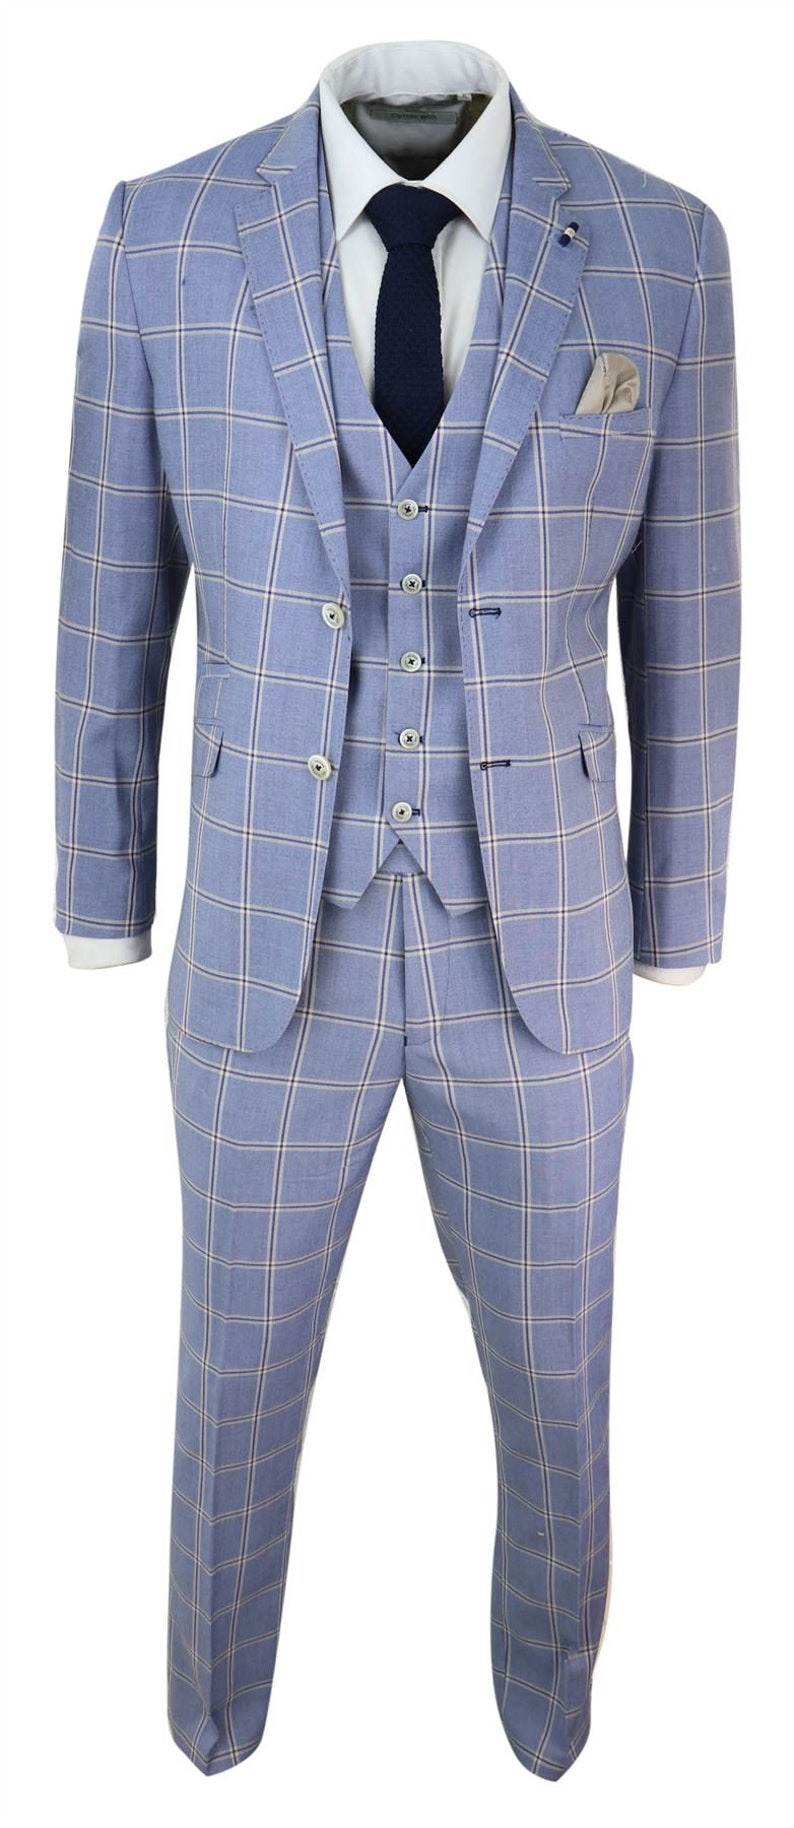 Men's Vintage Clothing | Retro Clothing for Men     Mens 3 Piece Suit Light Blue Check Vintage Classic Retro Tailored Fit Wedding $158.69 AT vintagedancer.com